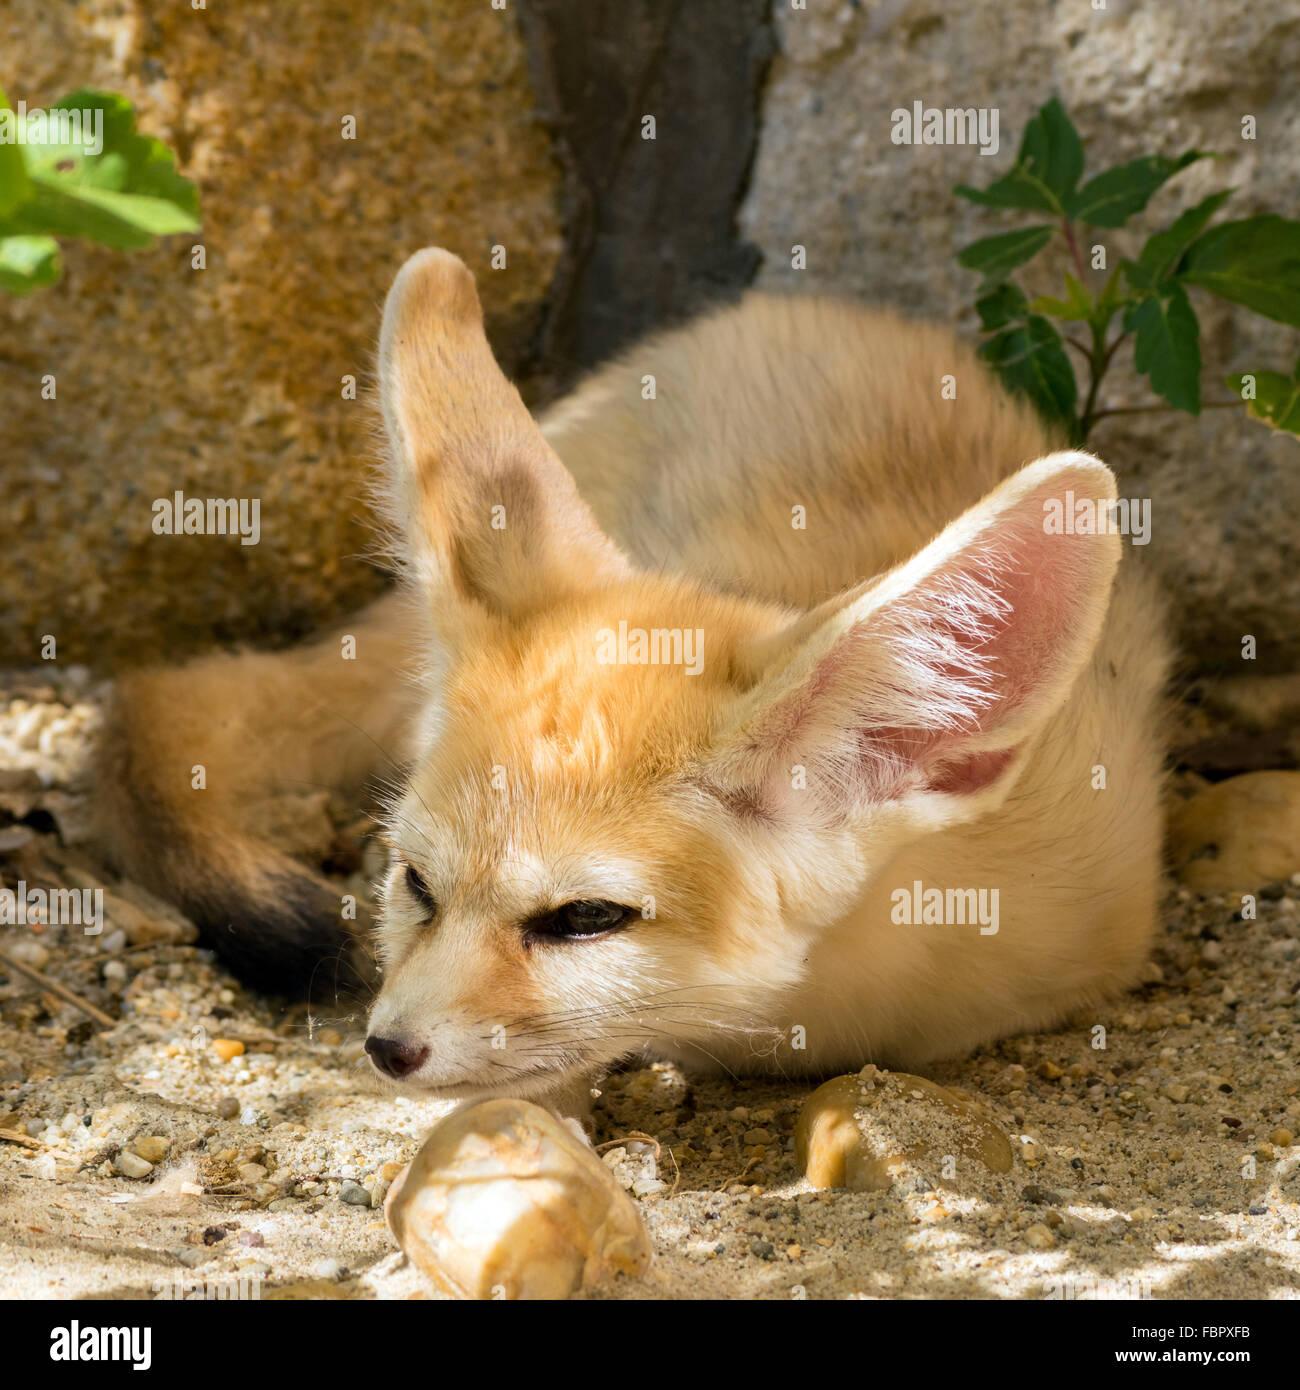 Fennec fox (Vulpes zerda) avec un sourire malicieux Photo Stock